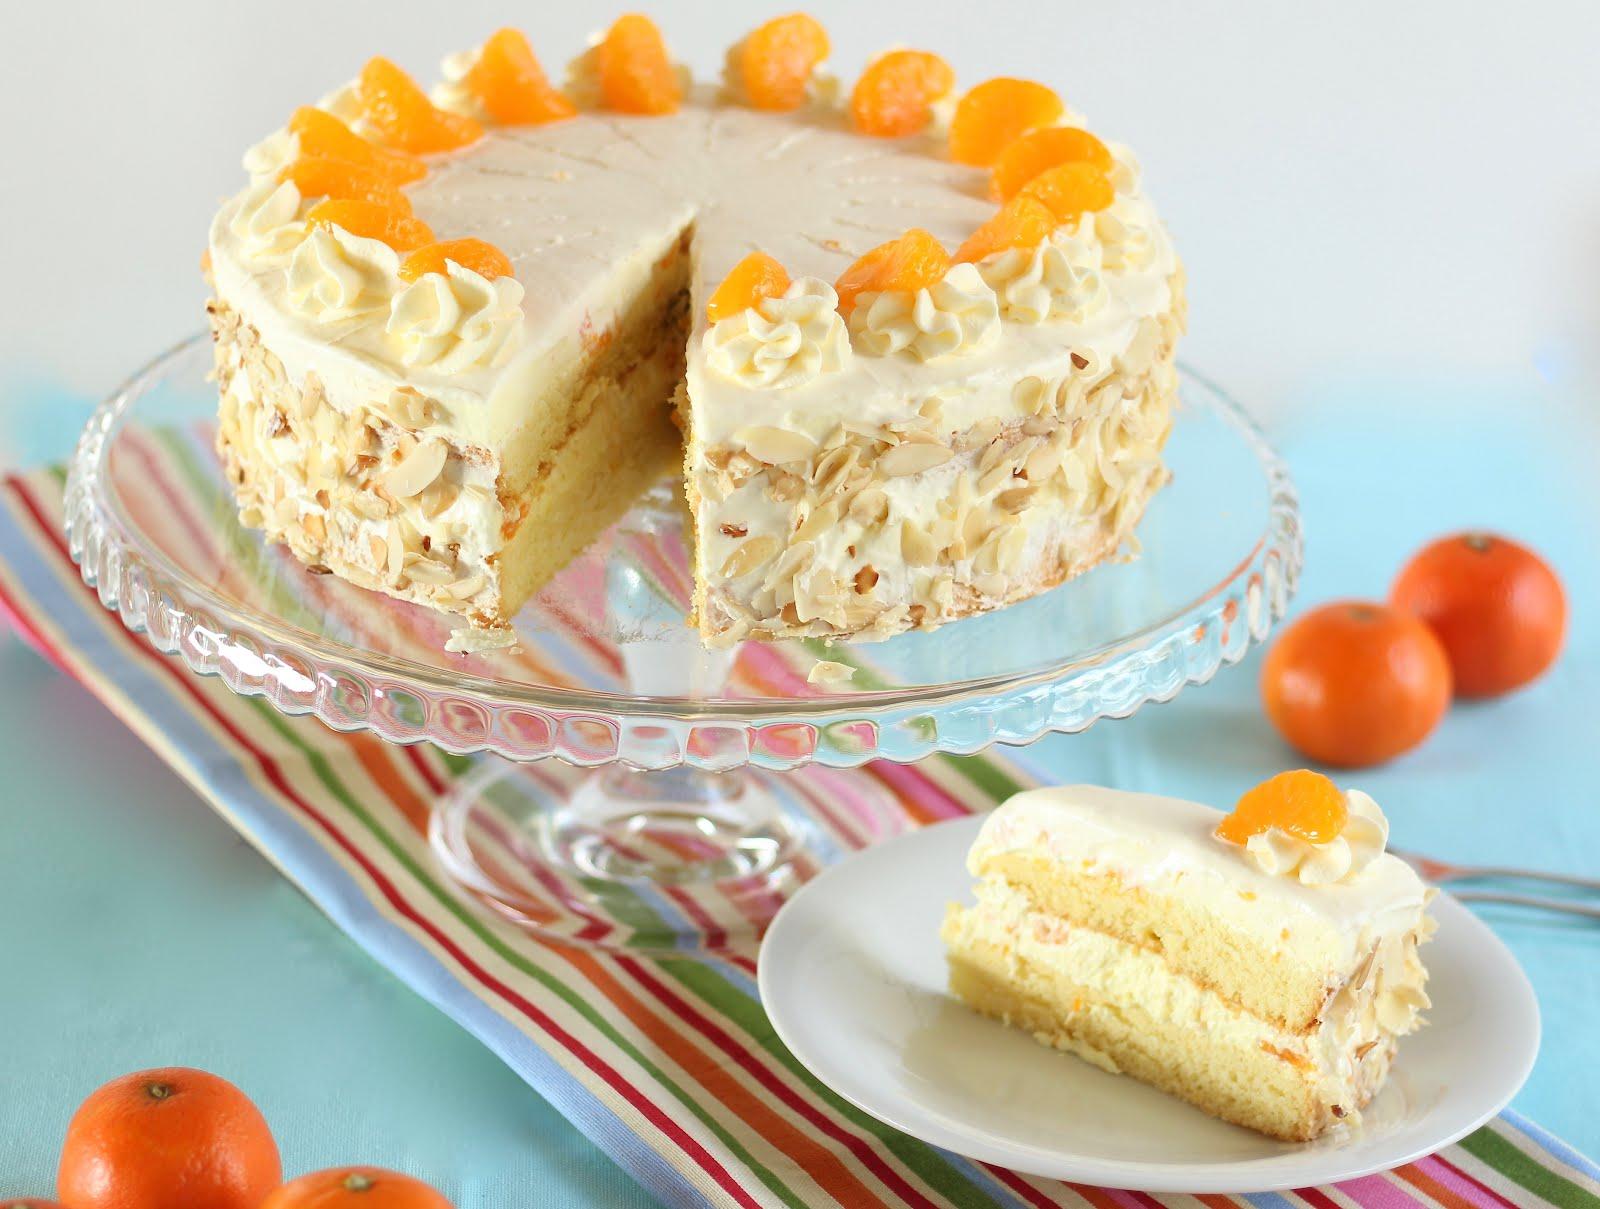 Kuchen u torten rezepte – Beliebte Hausrezepte